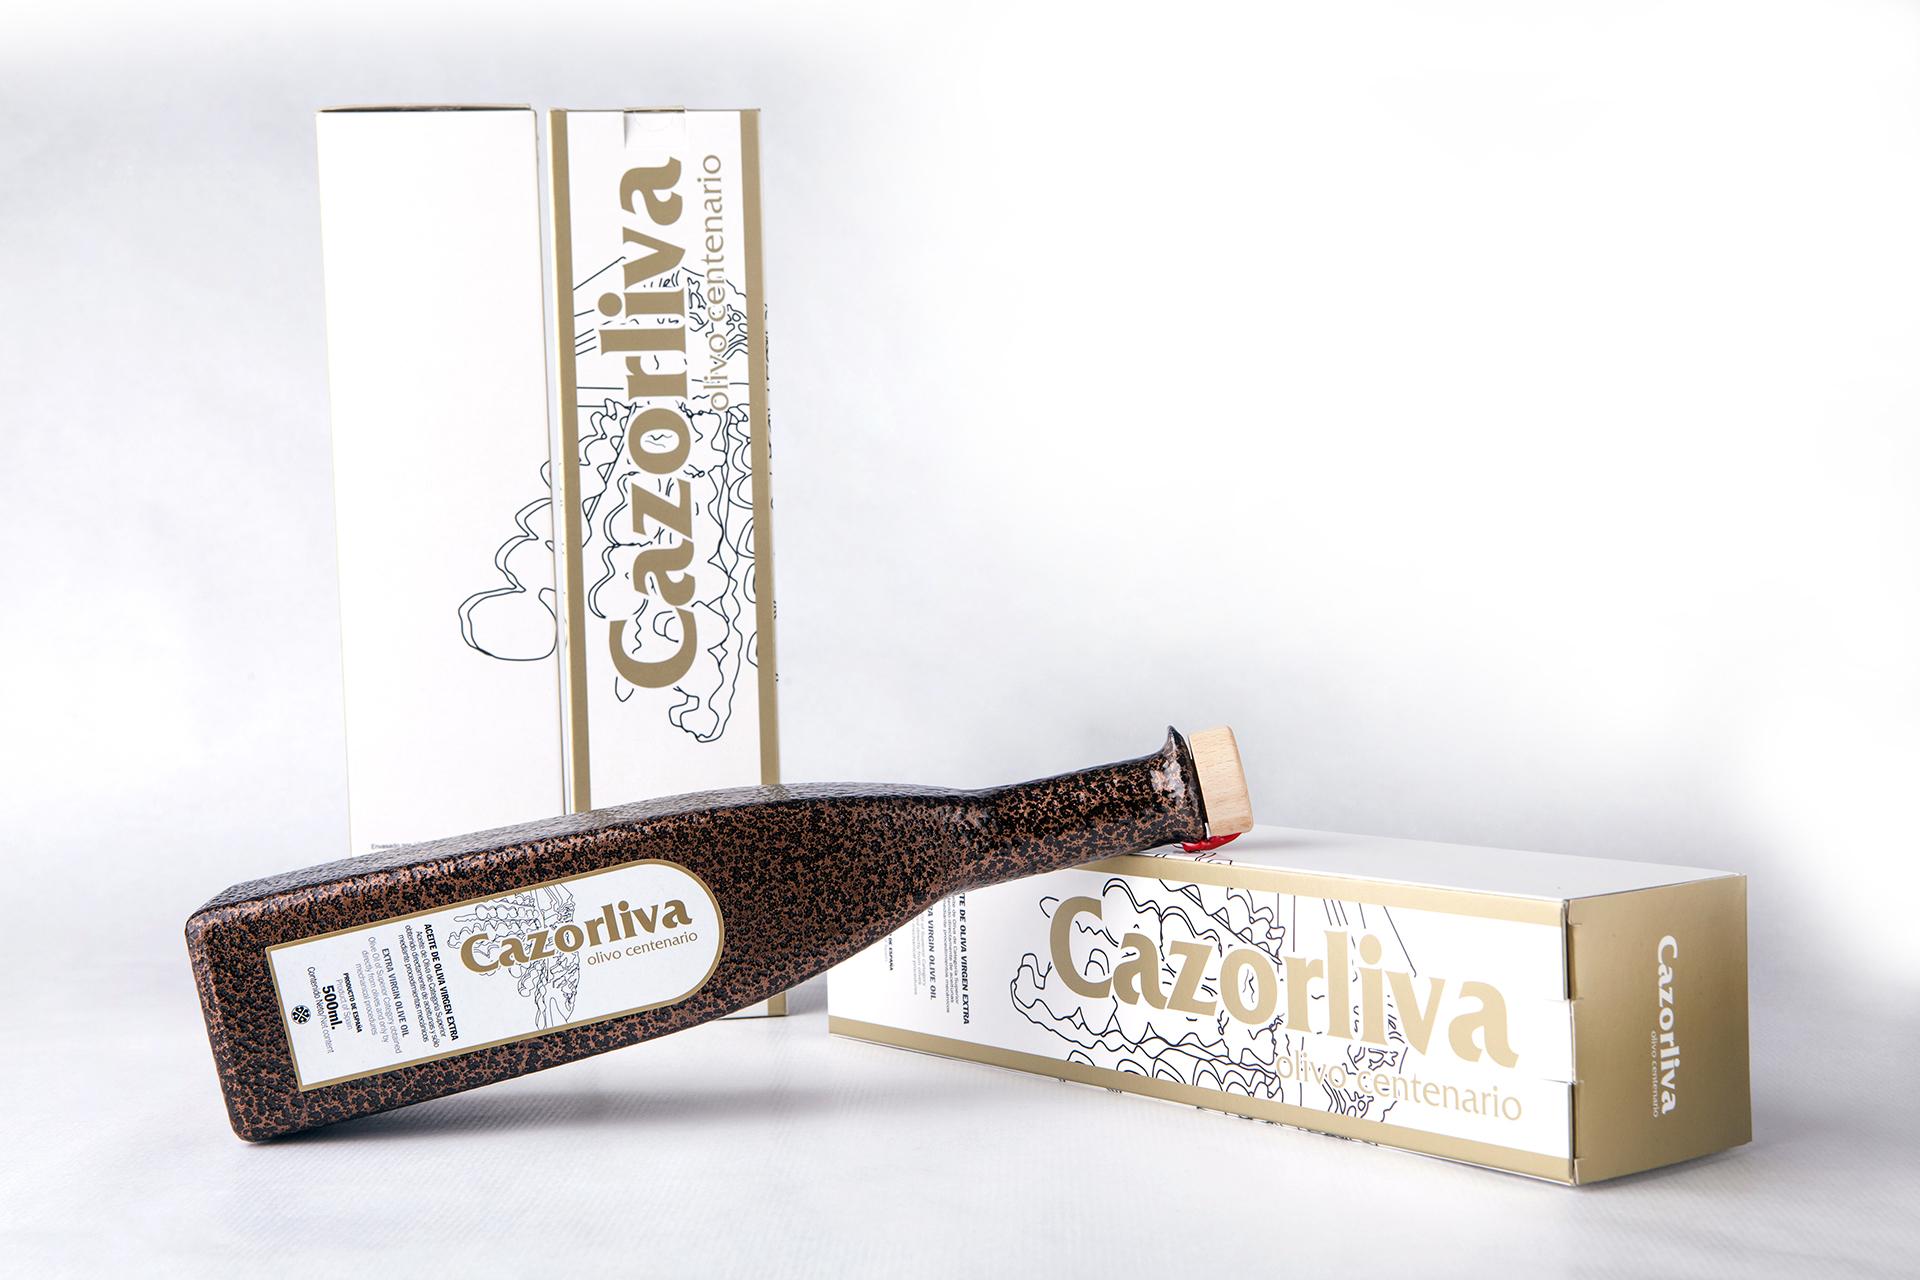 Cazorliva Olivo Centenario - JaenCoop